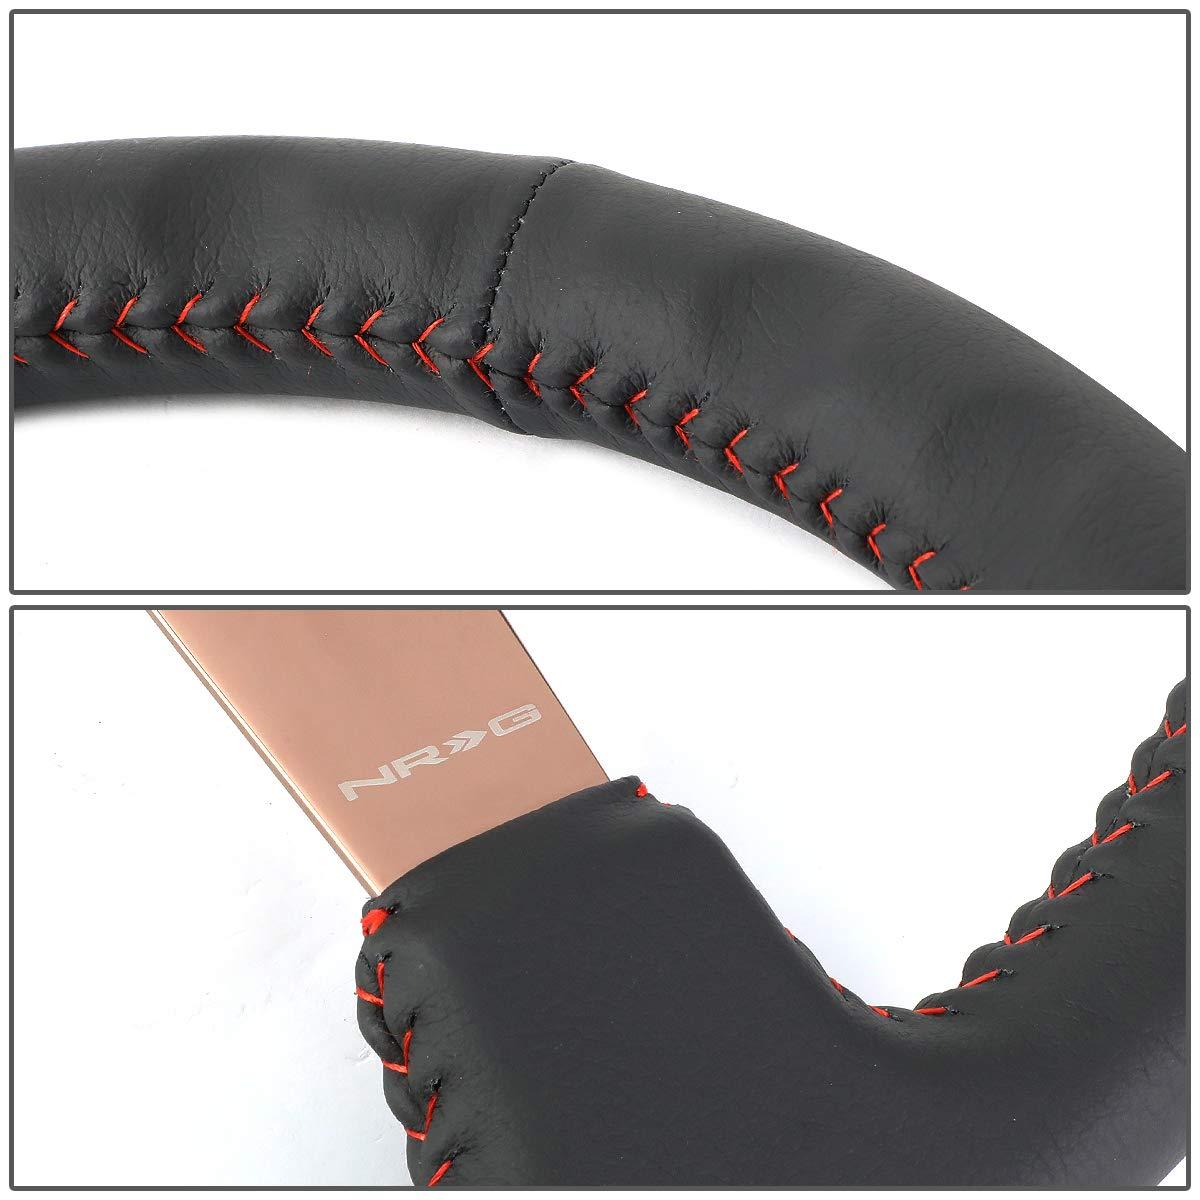 Black Leather, Red Baseball Stitch, Rose Gold spoke NRG Innovations ST-036RG 350mm Sport Wheel